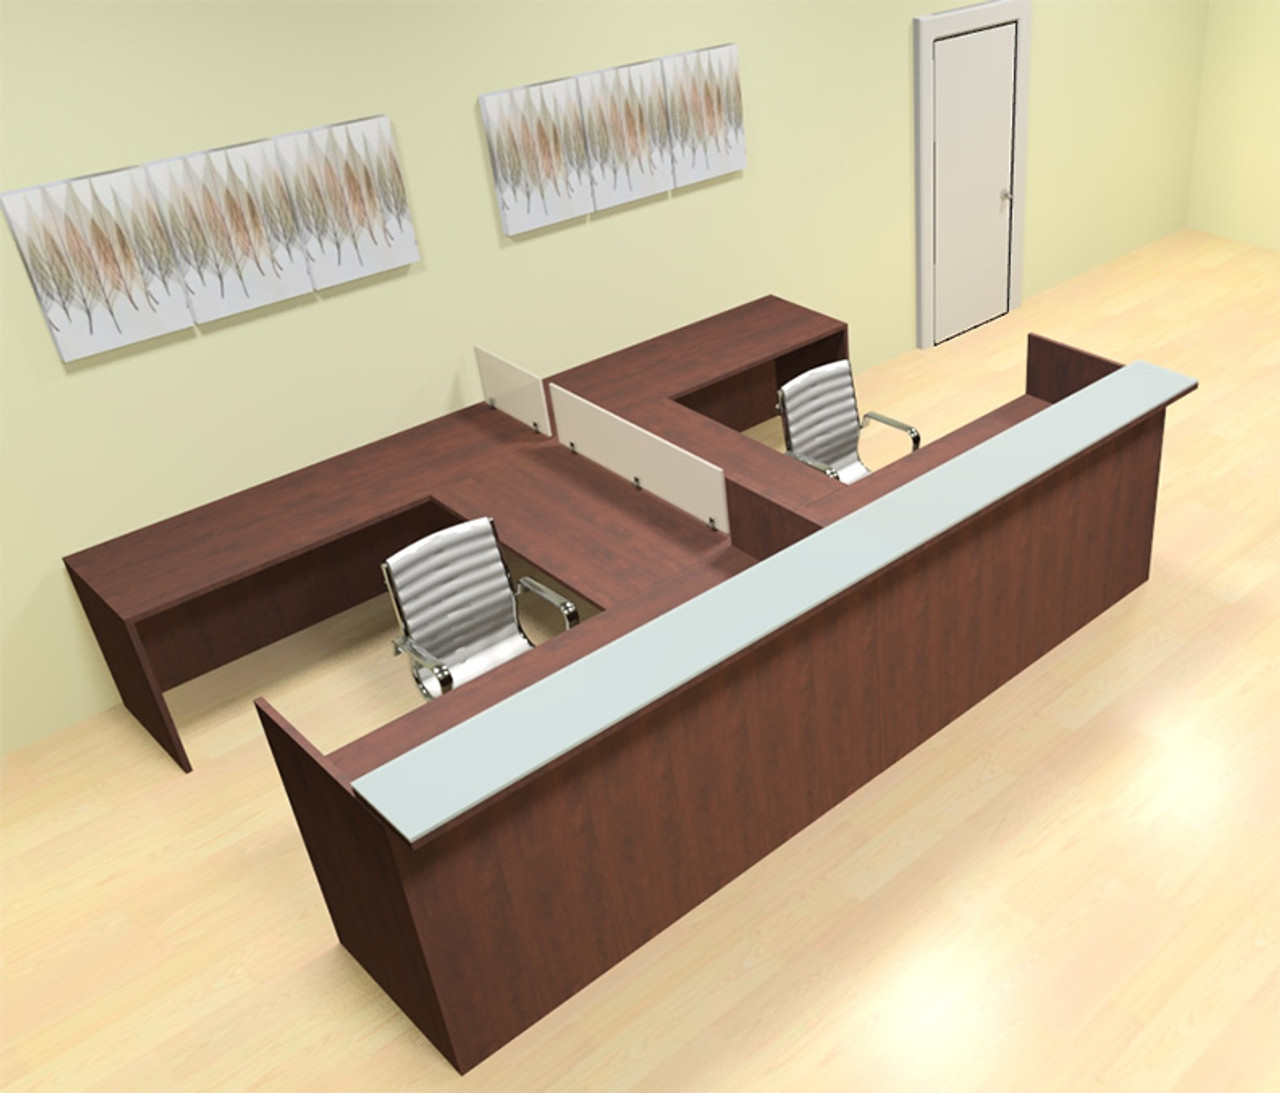 8pc 12' Feet U Shaped Glass Divider Counter Reception Desk Set, #CH-AMB-R16